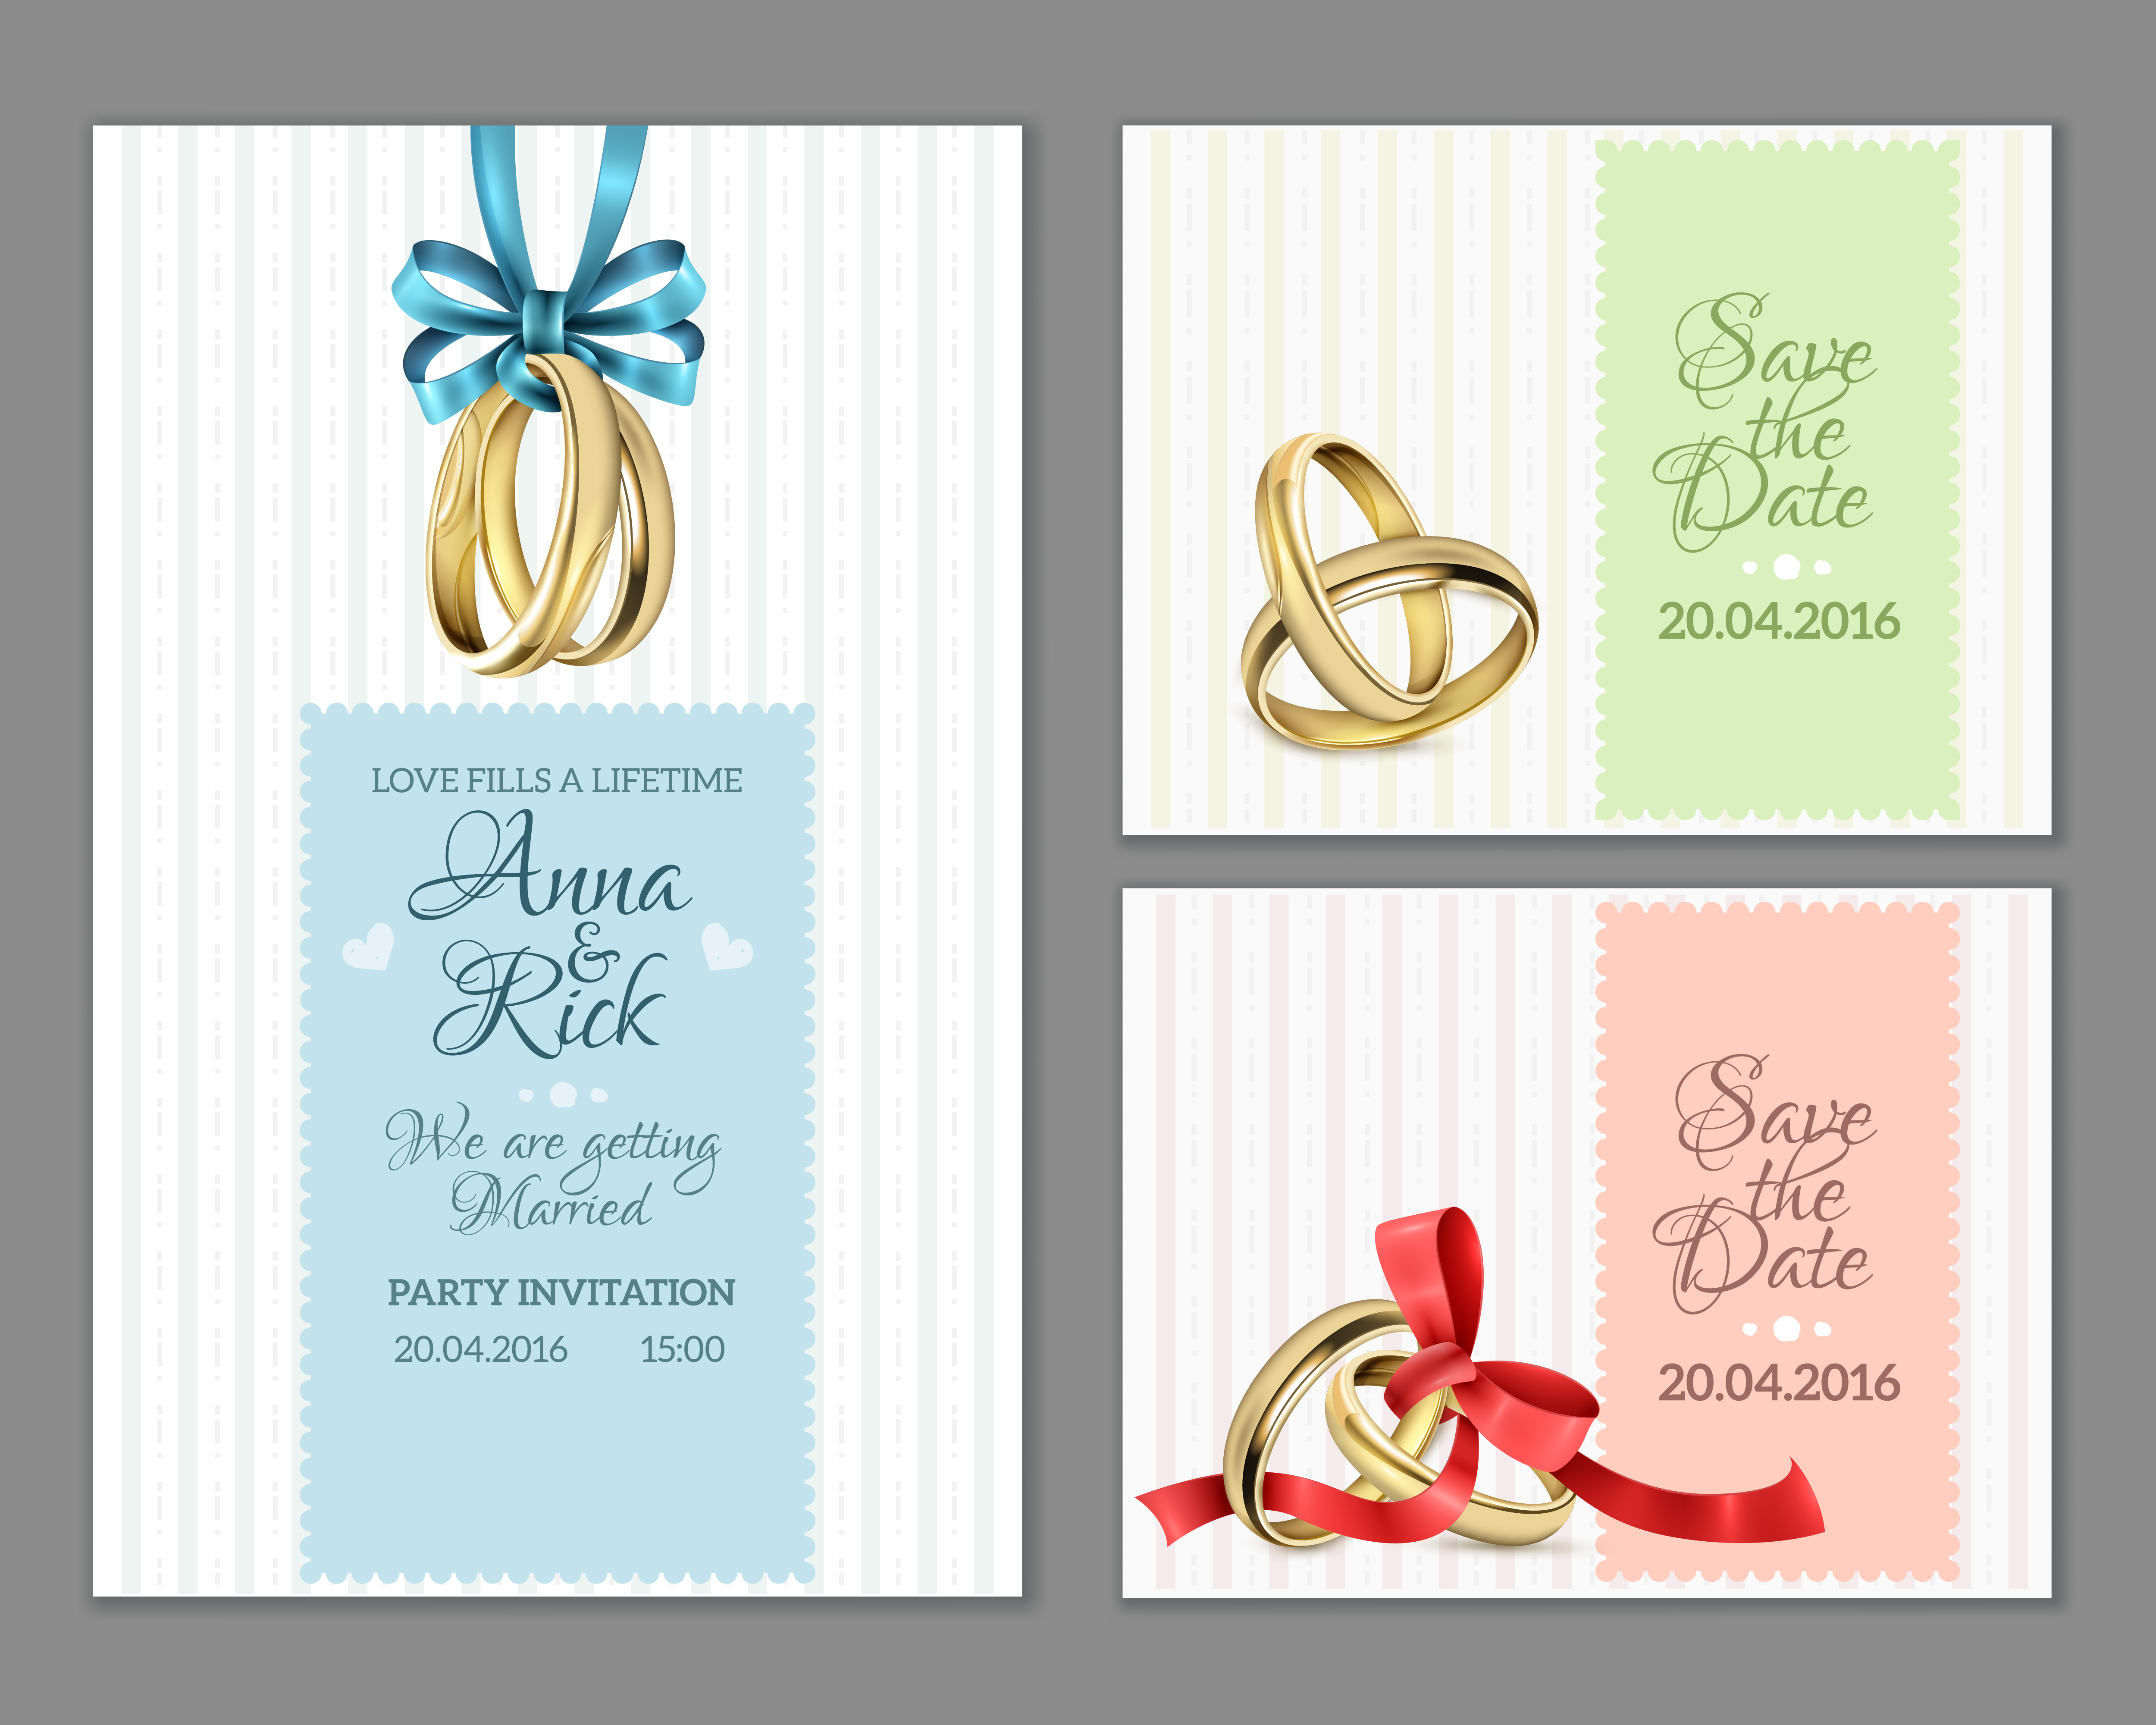 celebrate invitation wedding cards 483115  download free